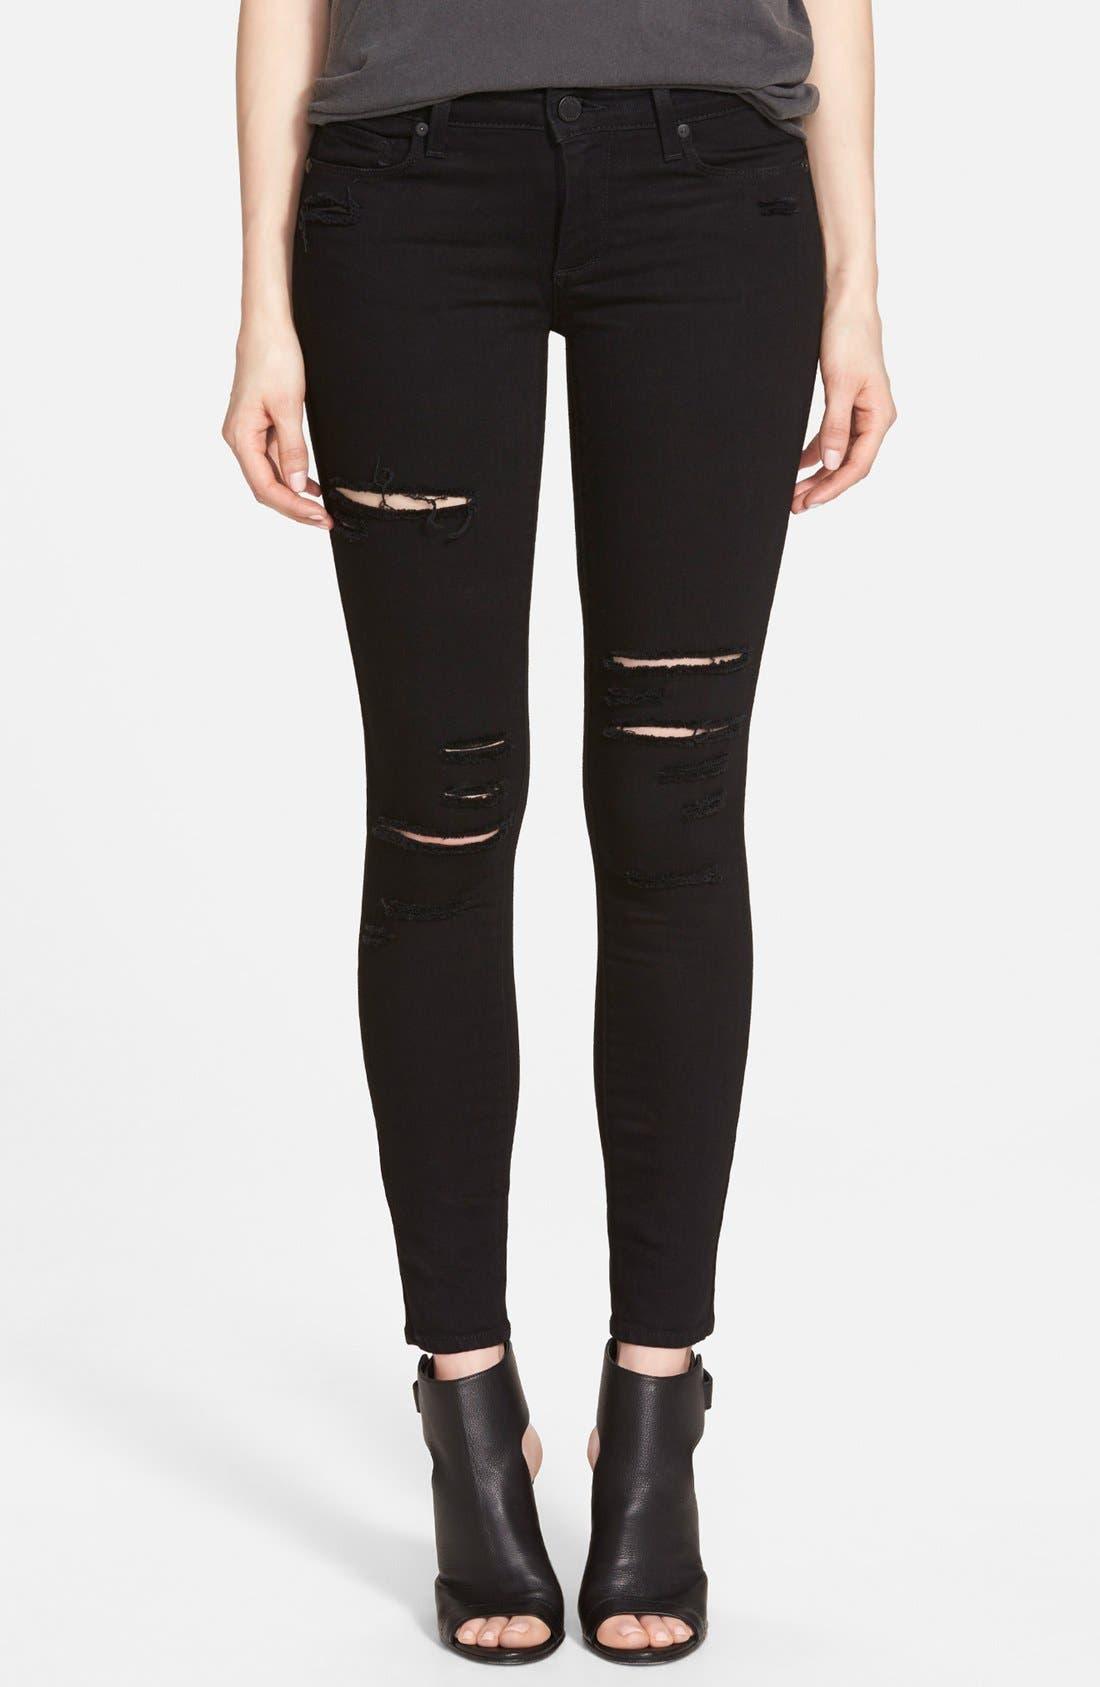 Alternate Image 1 Selected - Paige Denim 'Verdugo' Ankle Ultra Skinny Jeans (Black Arlo Destructed)